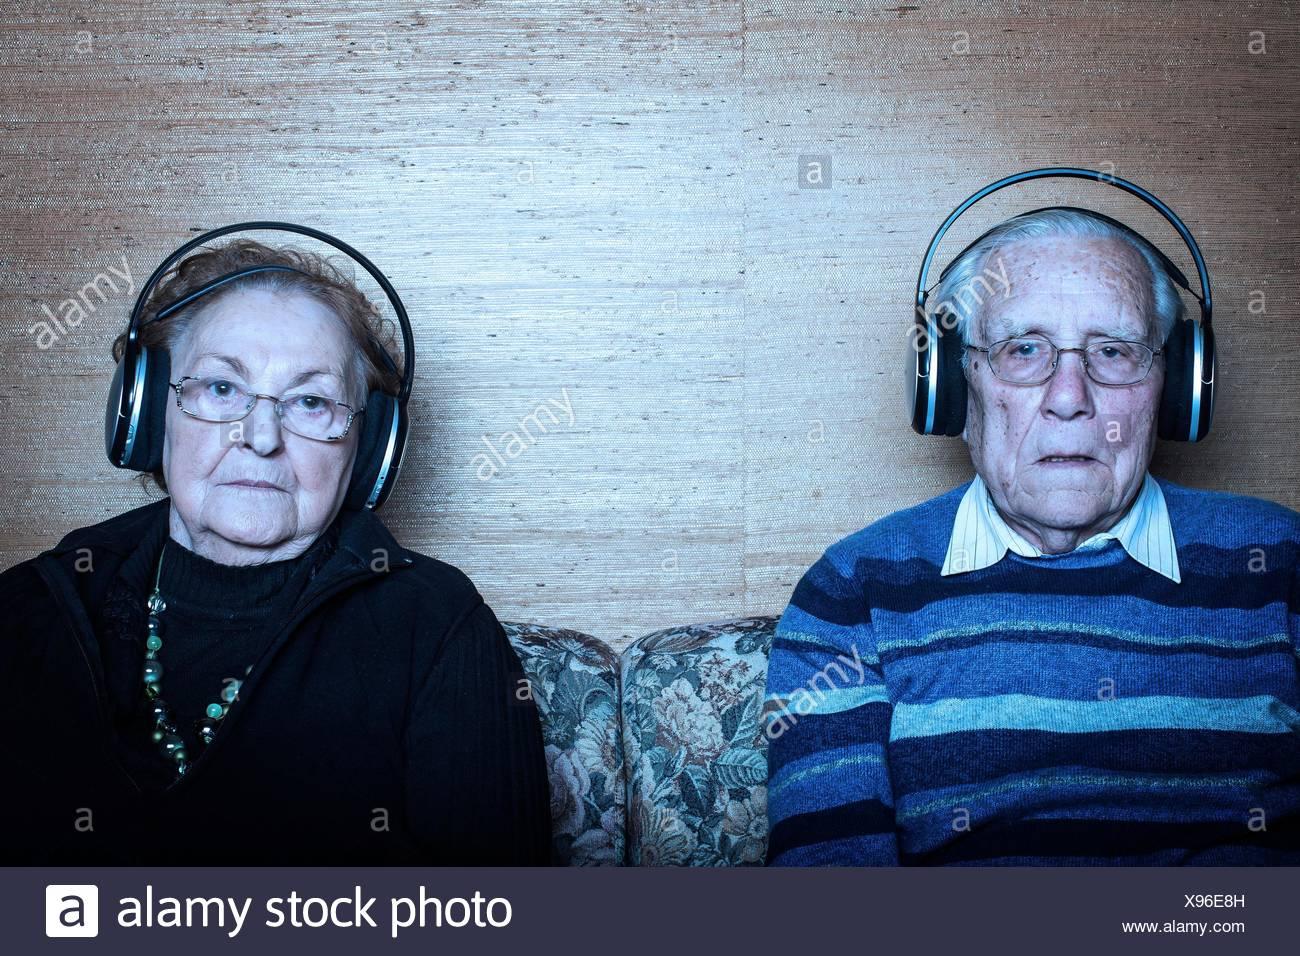 MODEL RELEASED. Senior couple sitting on sofa wearing headphones. - Stock Image